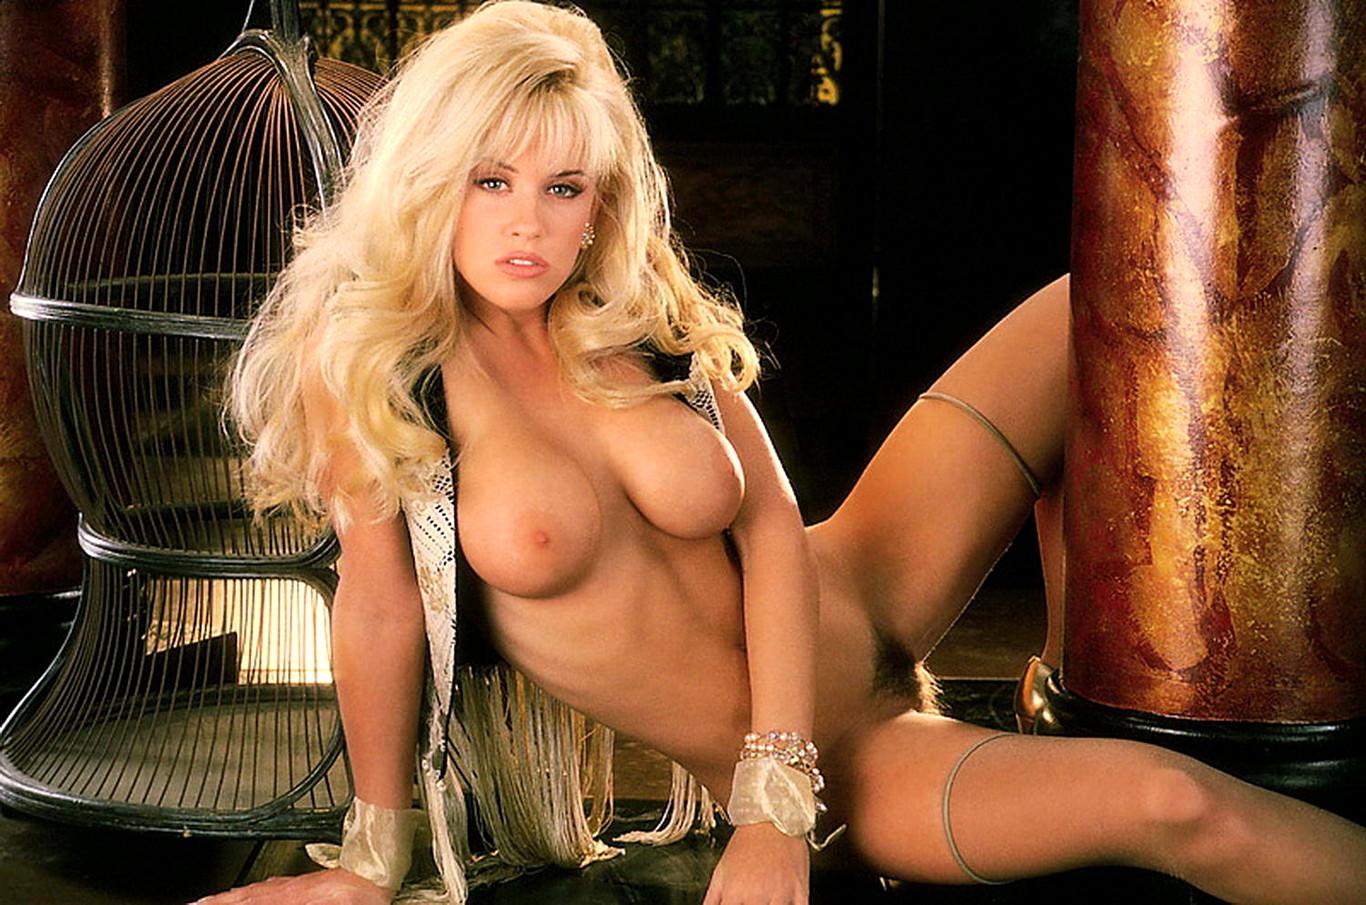 Jennifer wallace westland michigan blonde sex, xxx interracial cartoons